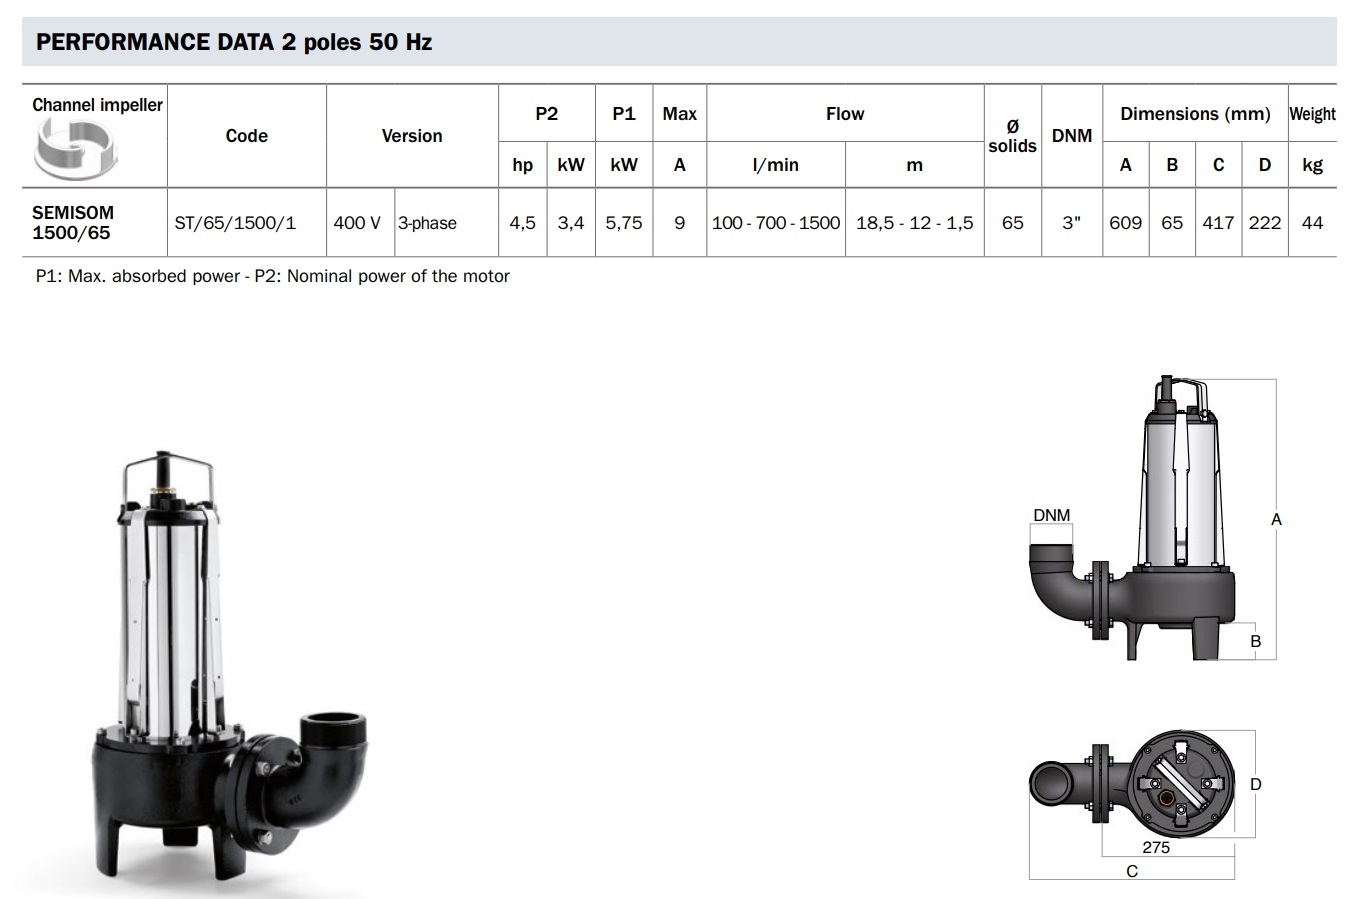 Dimensioni pesi dati elettrici pompa sommersa ST/65 BBC Semisom